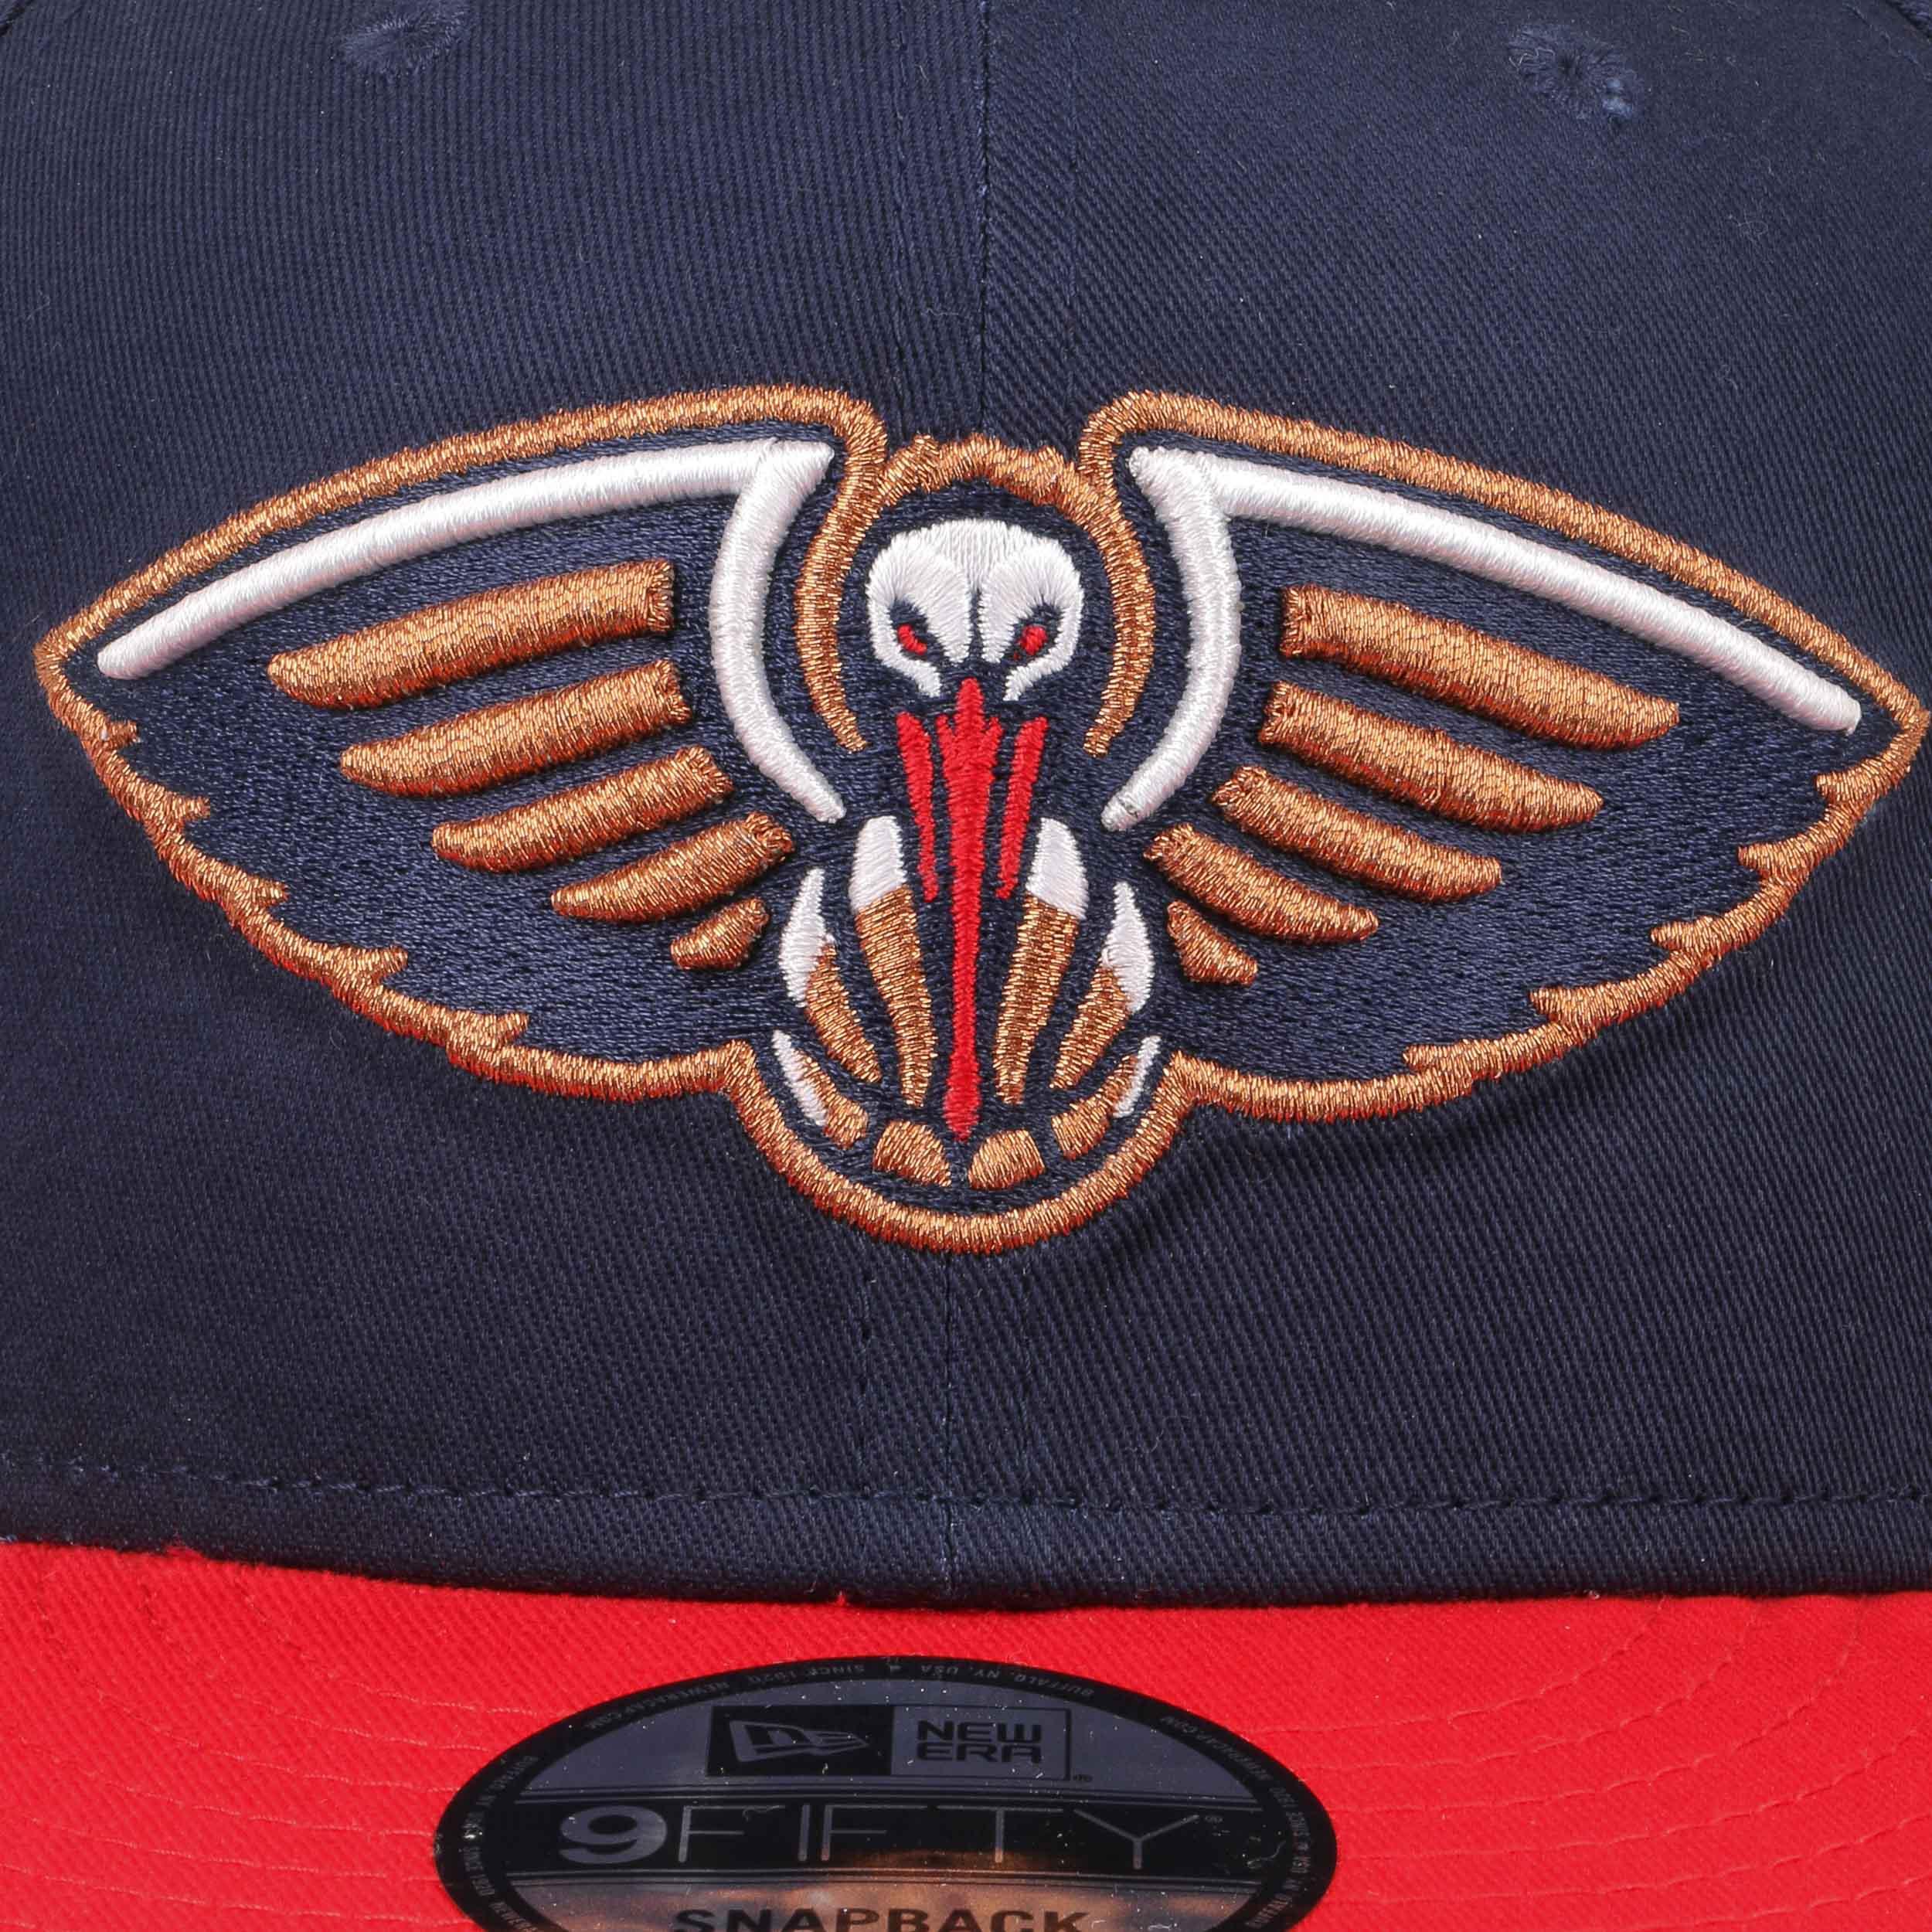 ... Gorra 9Fifty OTC Pelicans by New Era - azul oscuro 4 ... 39c090c8ab6